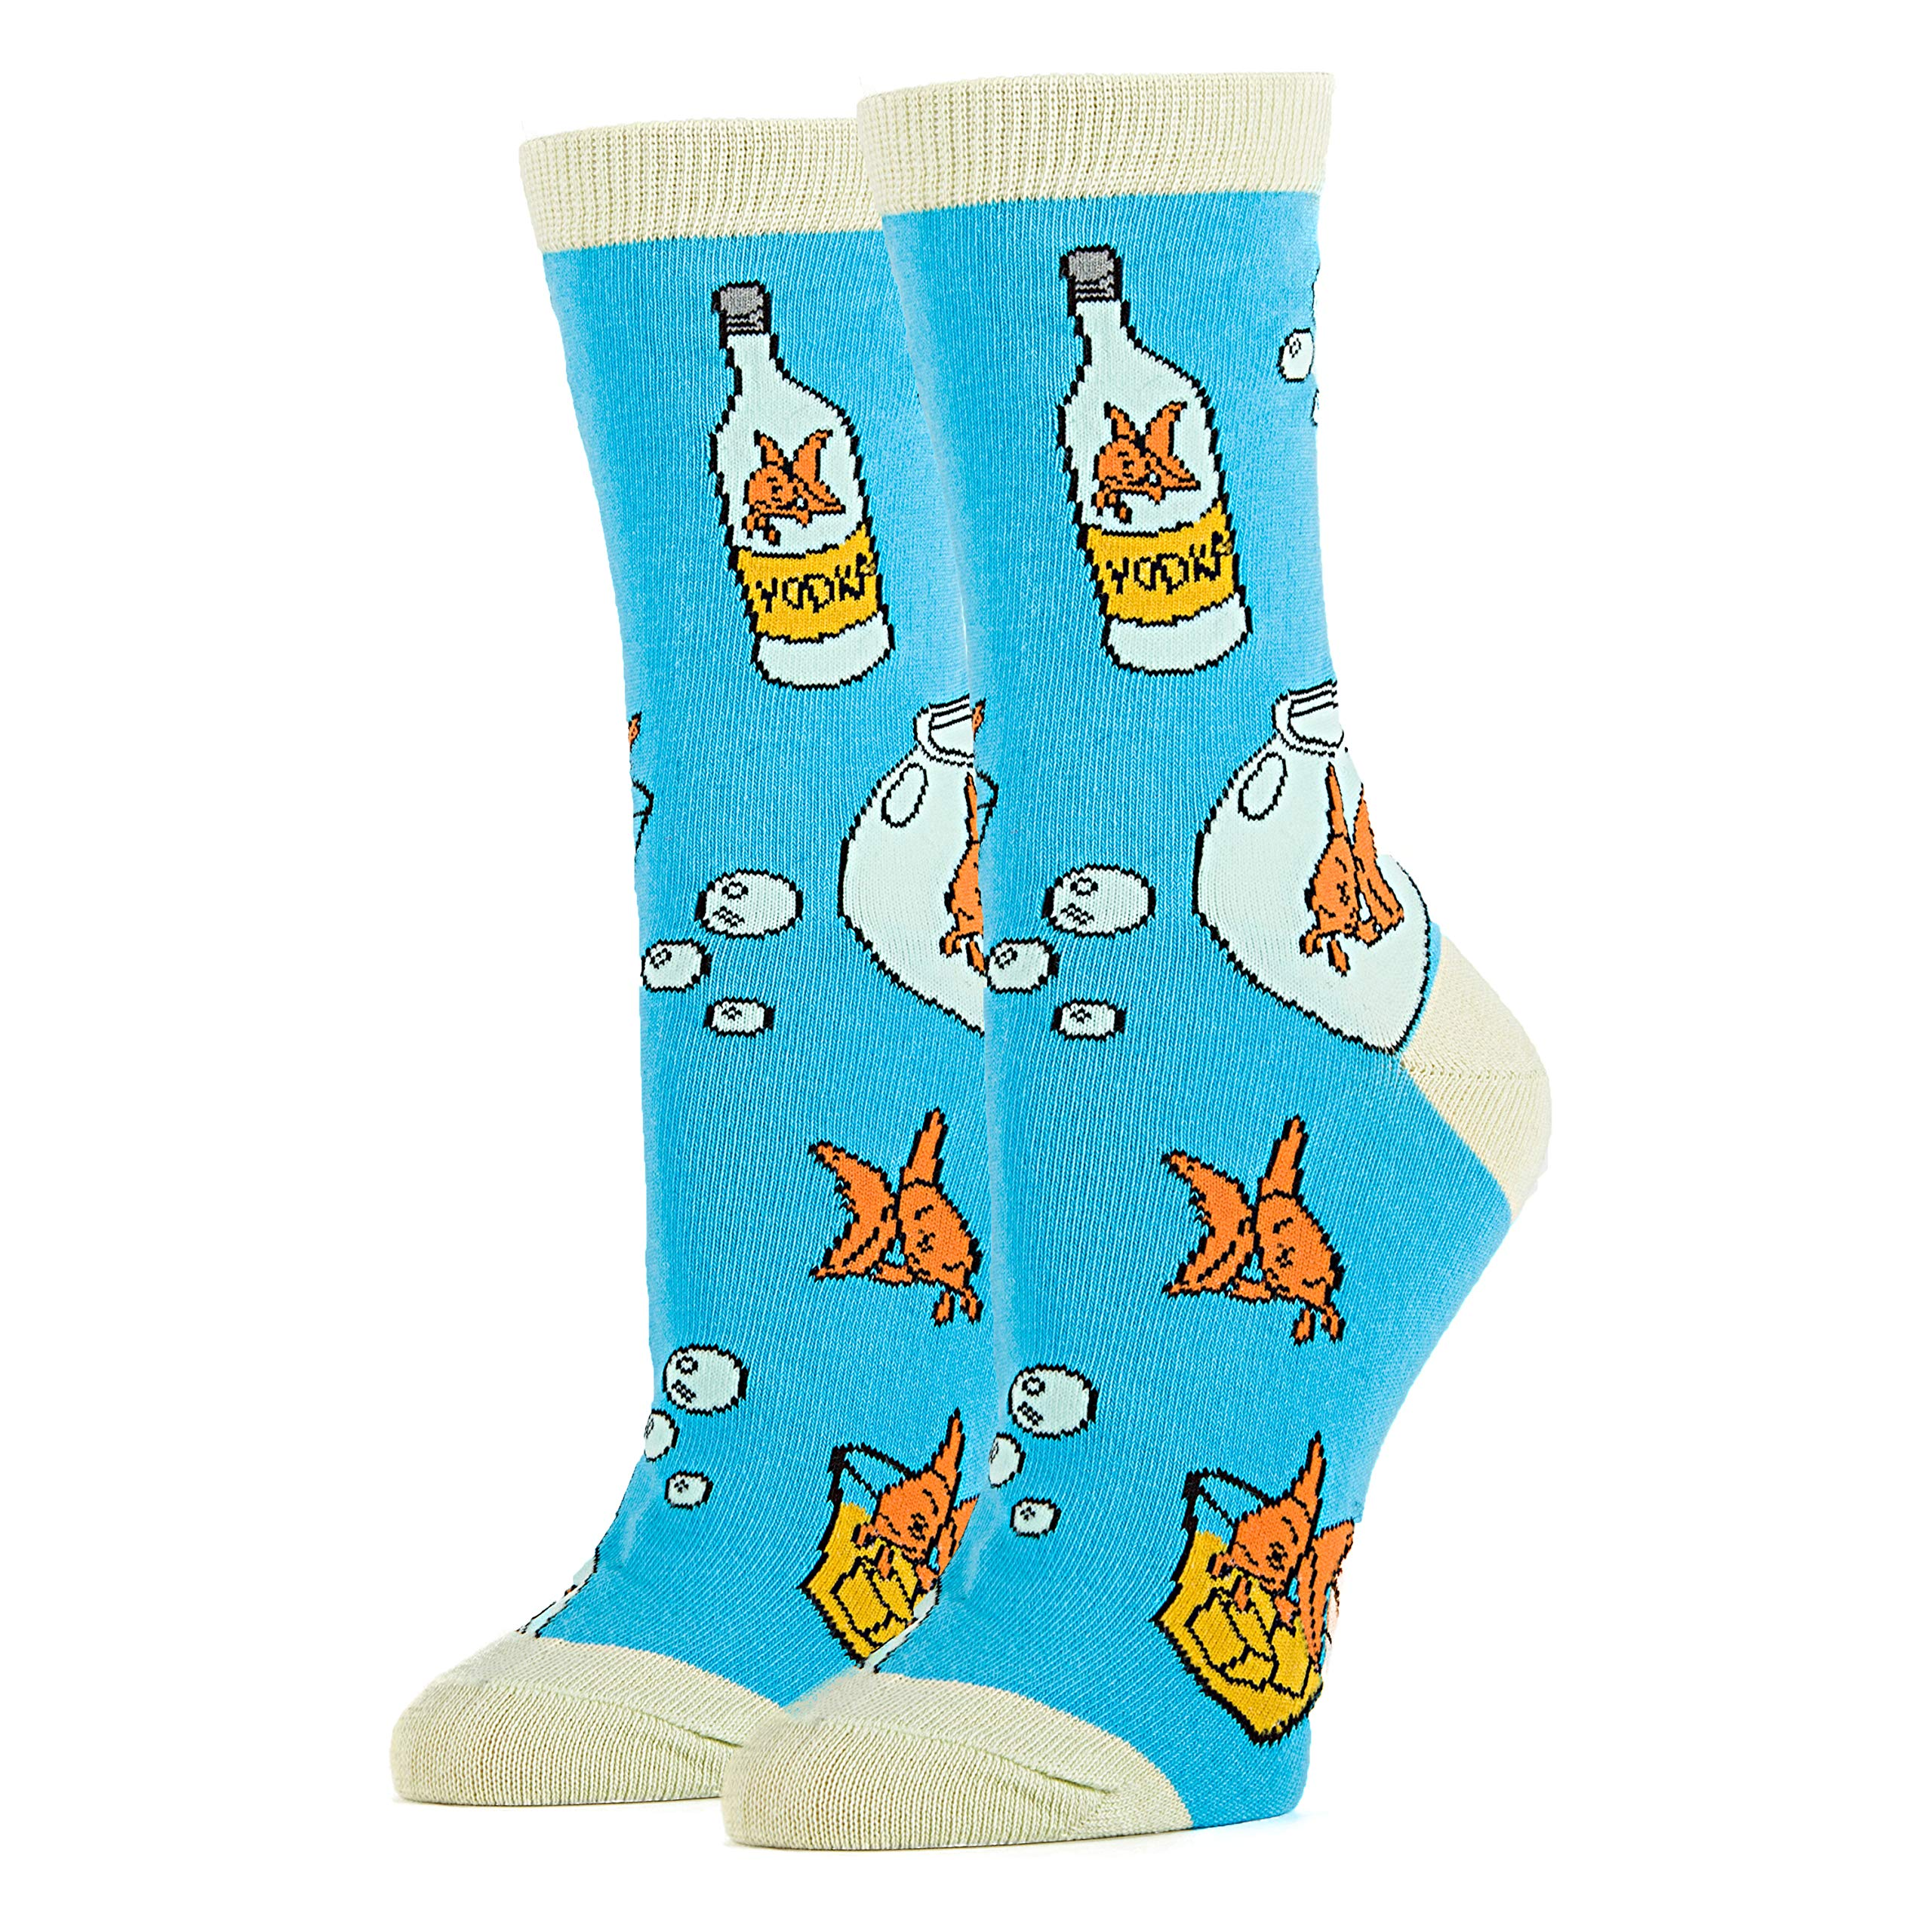 Casual Dress Socks Cool Fashion Socks Funny Crazy Silly Socks Womens Novelty Crew Socks